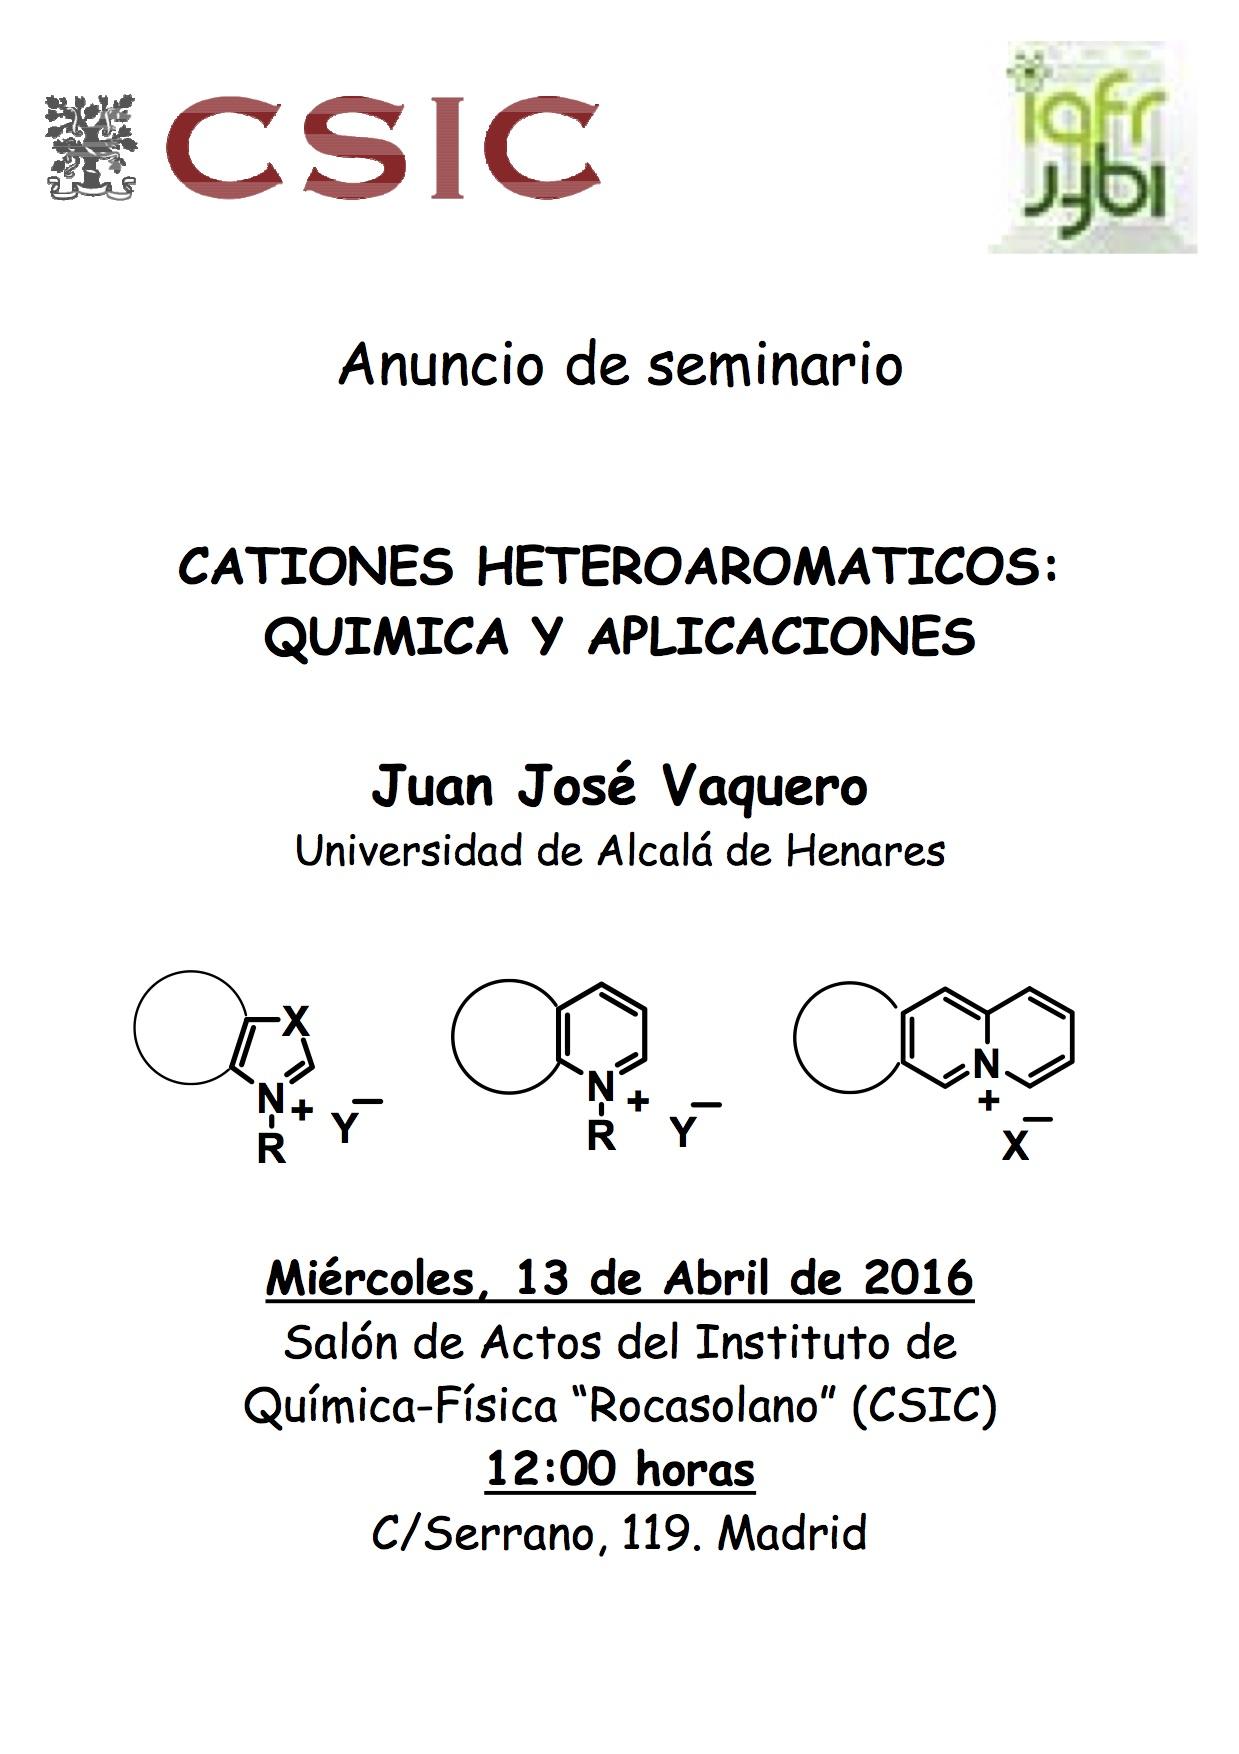 Seminario_Vaquero_IQFR_13abril2016